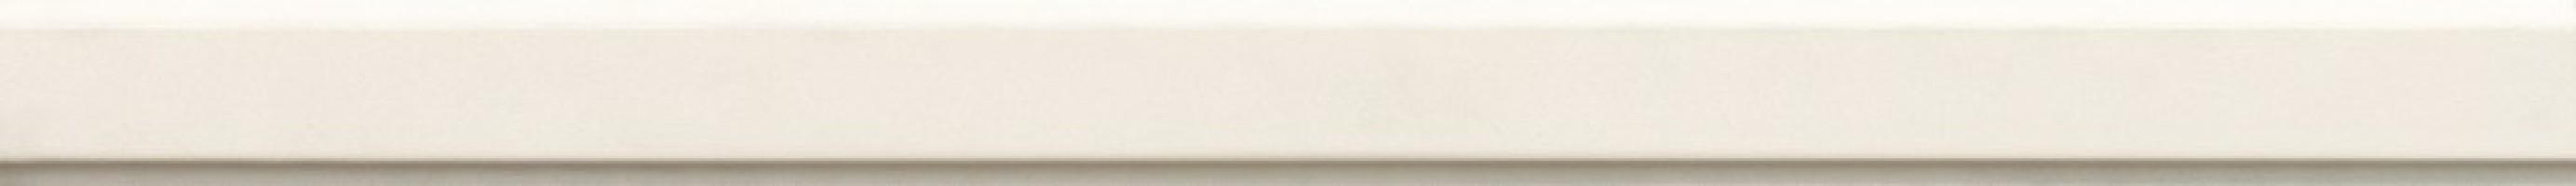 Бордюр Marca Corona Victoria Gypsum List 3x40 I005